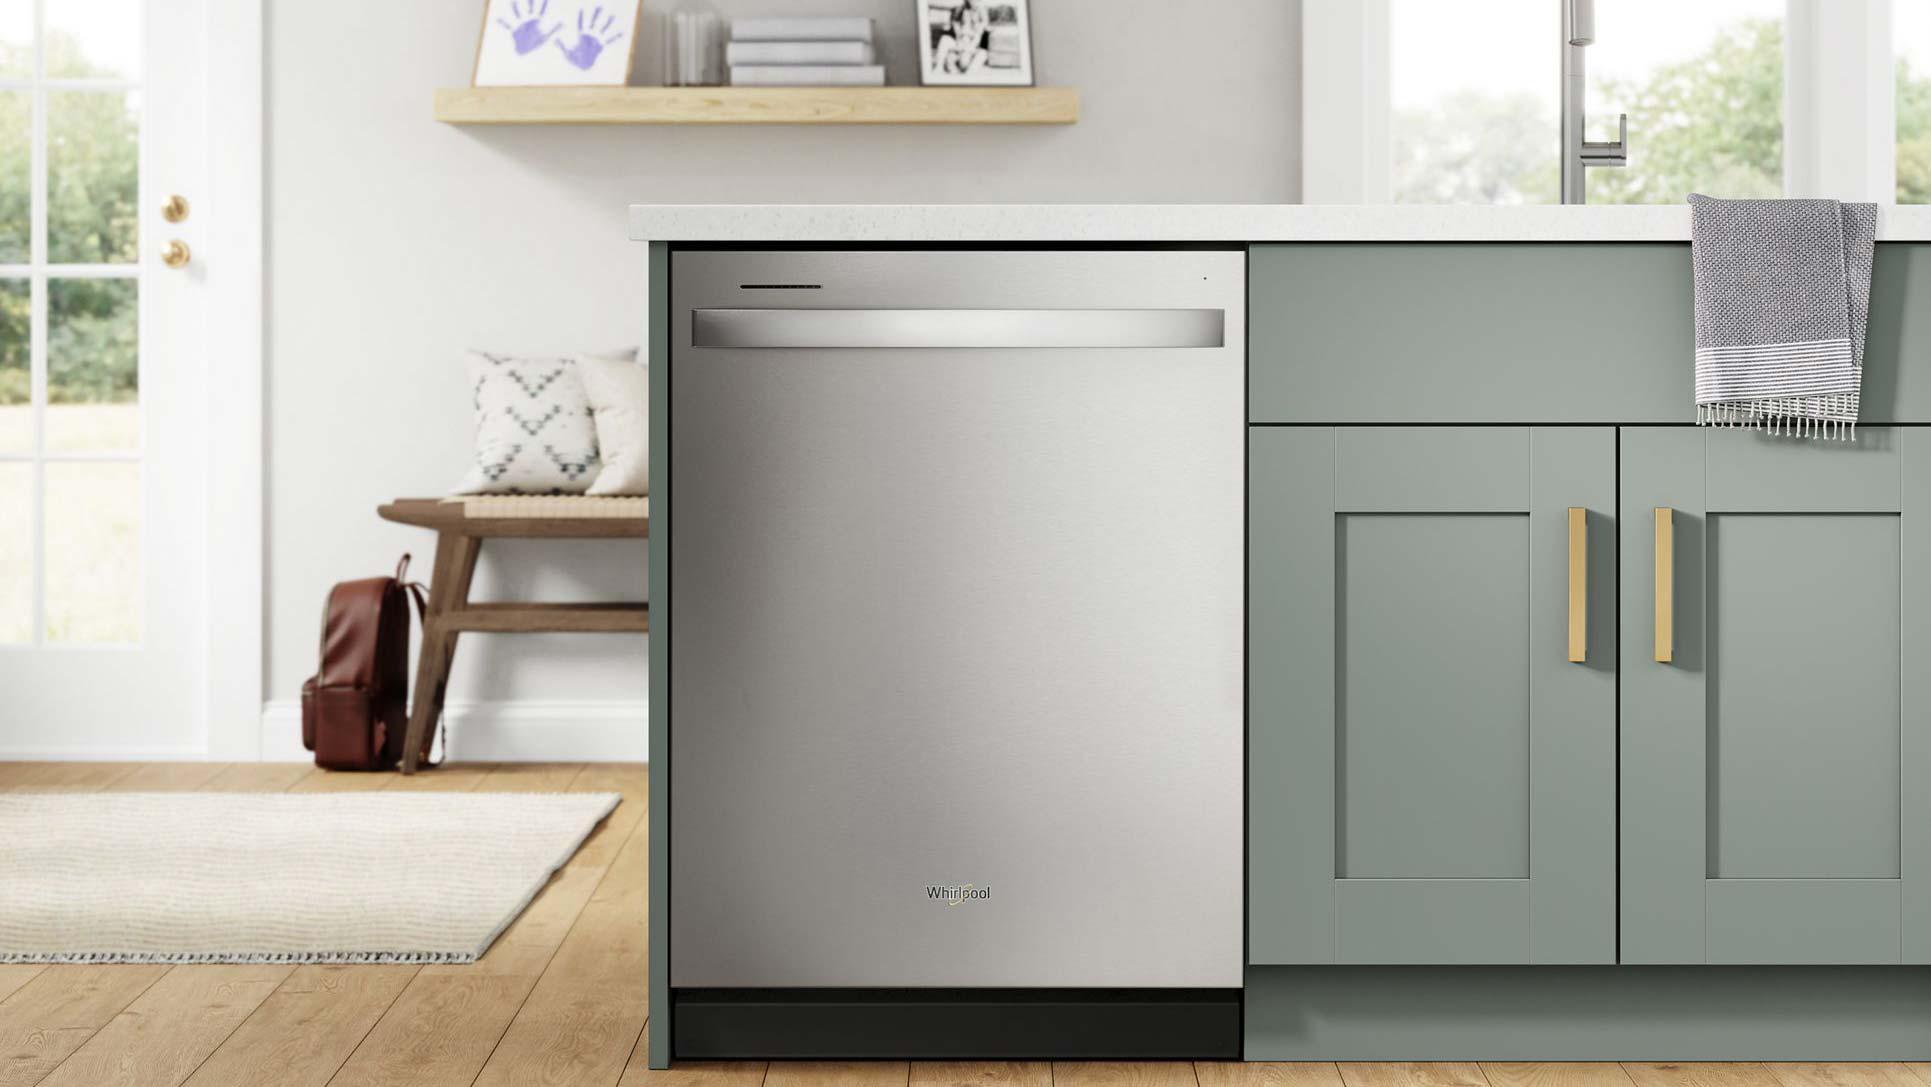 best dishwashers: Whirlpool WDT750SAKZ